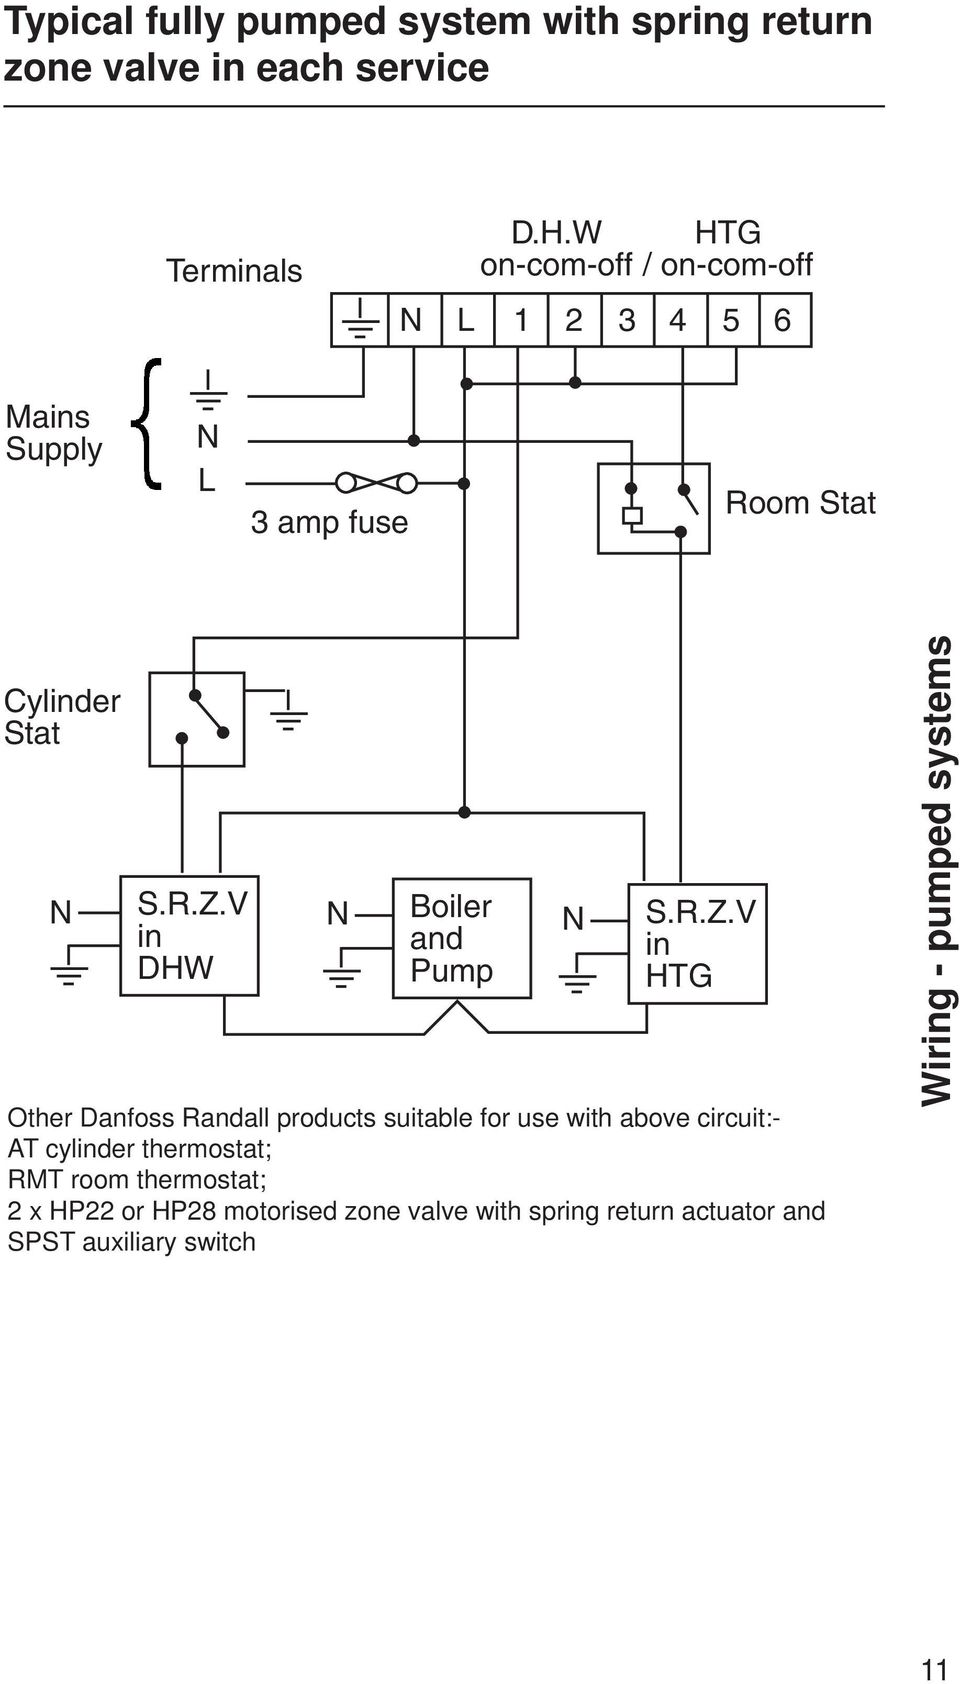 medium resolution of danfoss randall ltd dual cylinder thermostat wiring diagram set3m electro mechanical 24 programmer